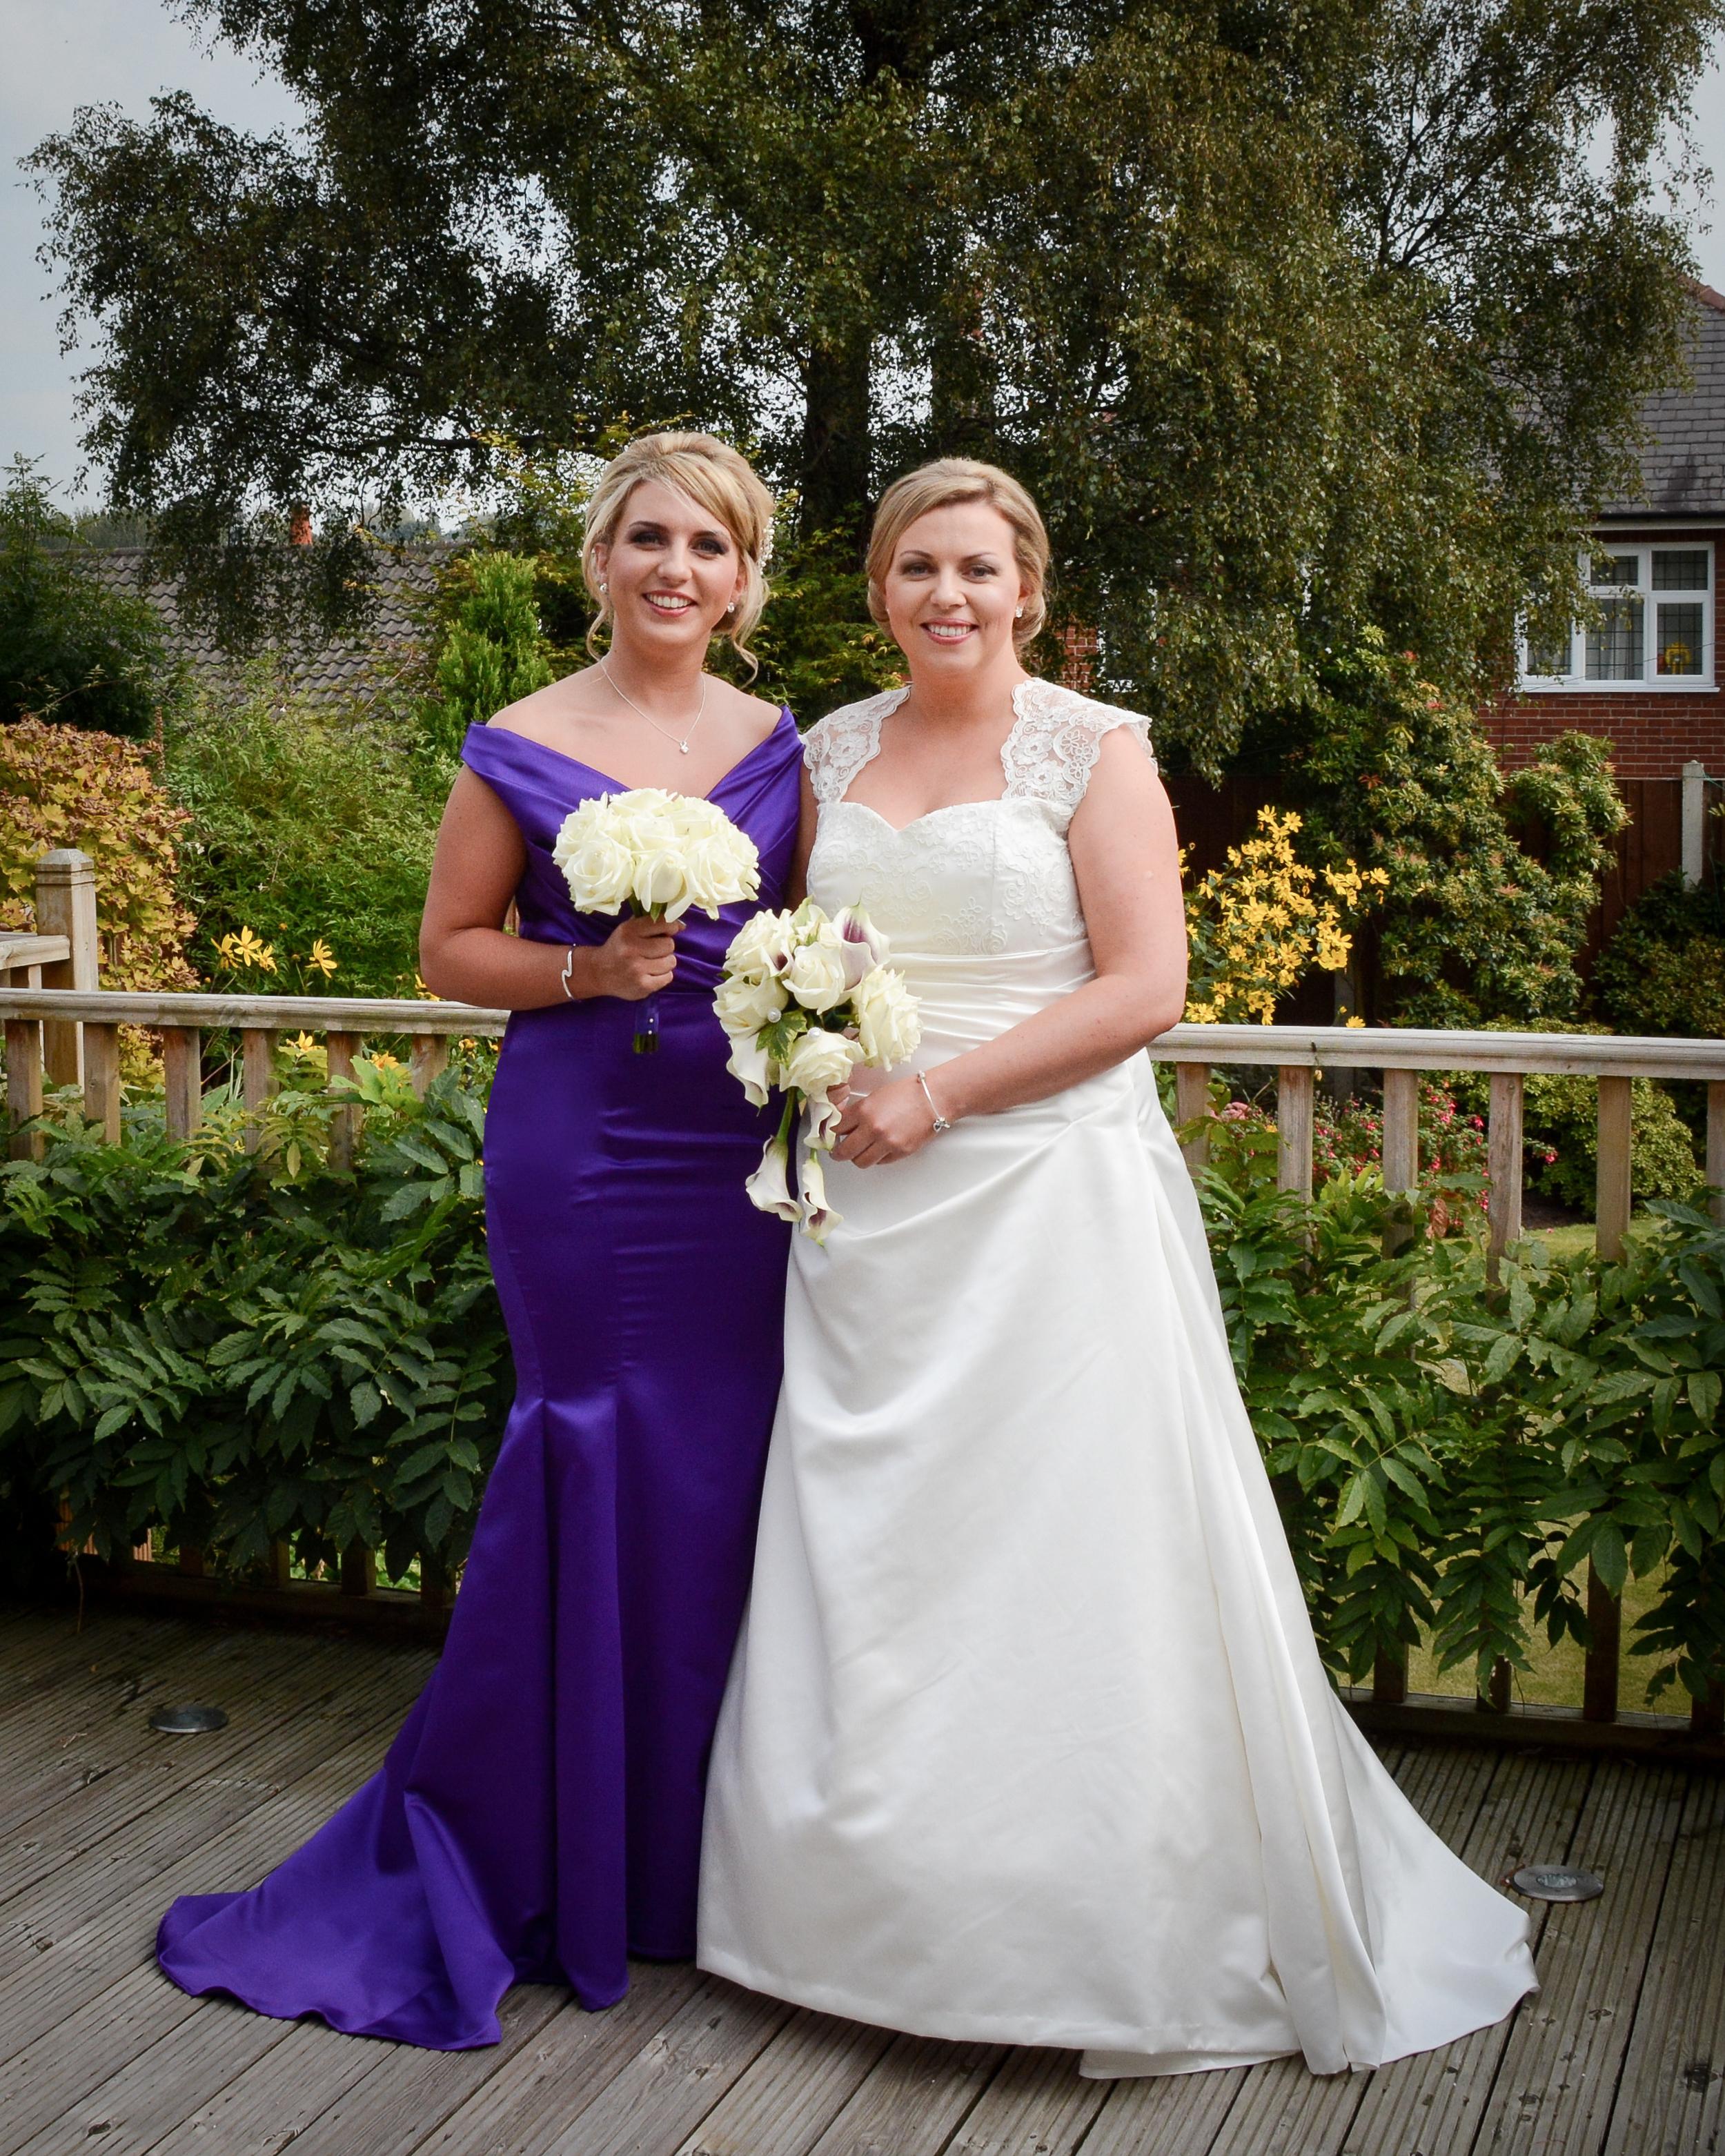 Bespoke Bride & Bridesmaid Dresses by Jessica Bennett Bespoke Bride